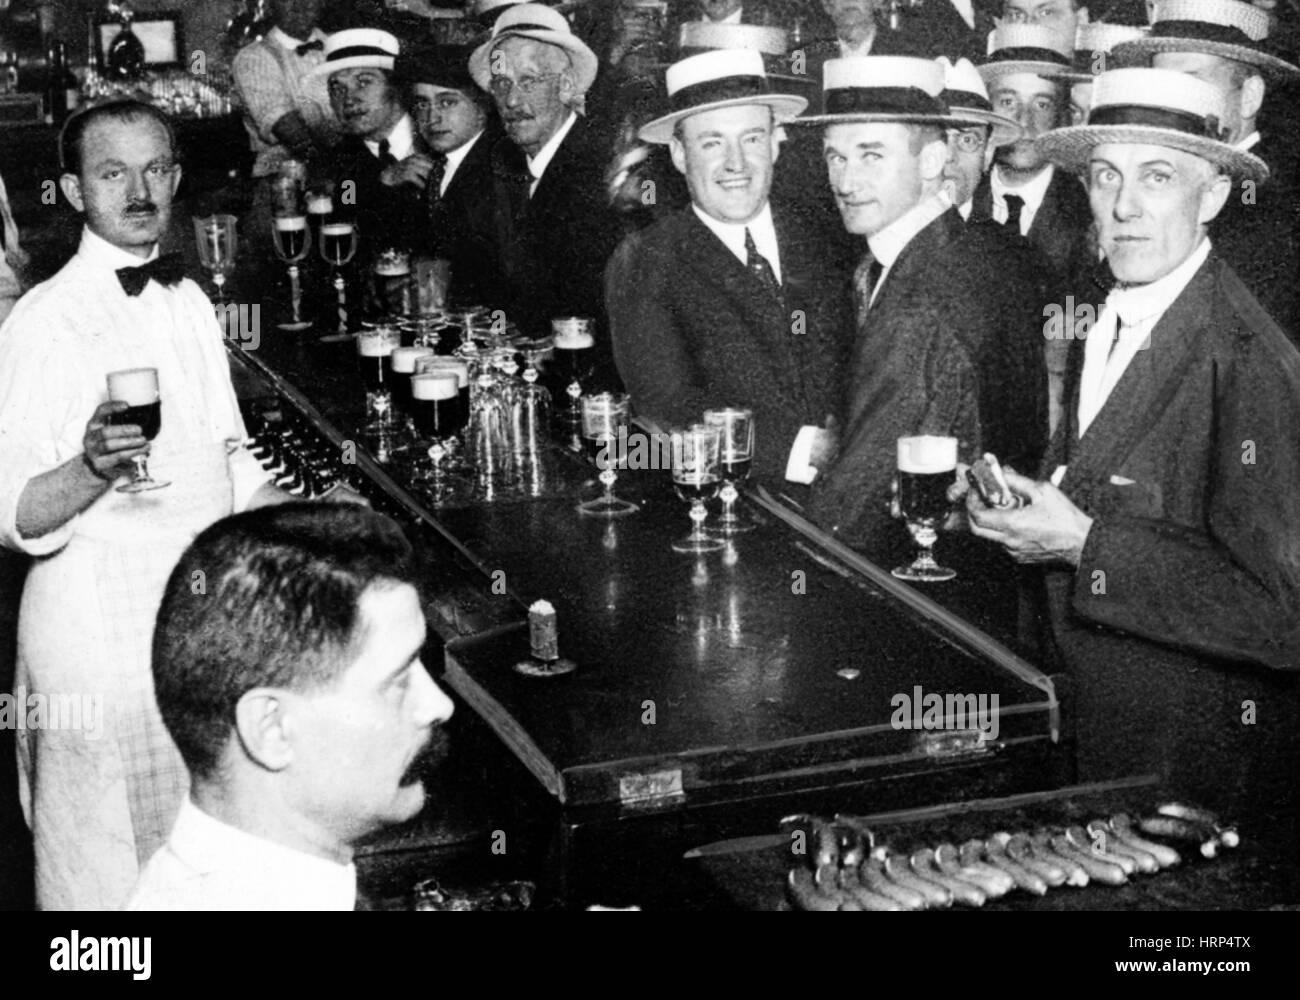 Prohibition Countdown, 1919 - Stock Image